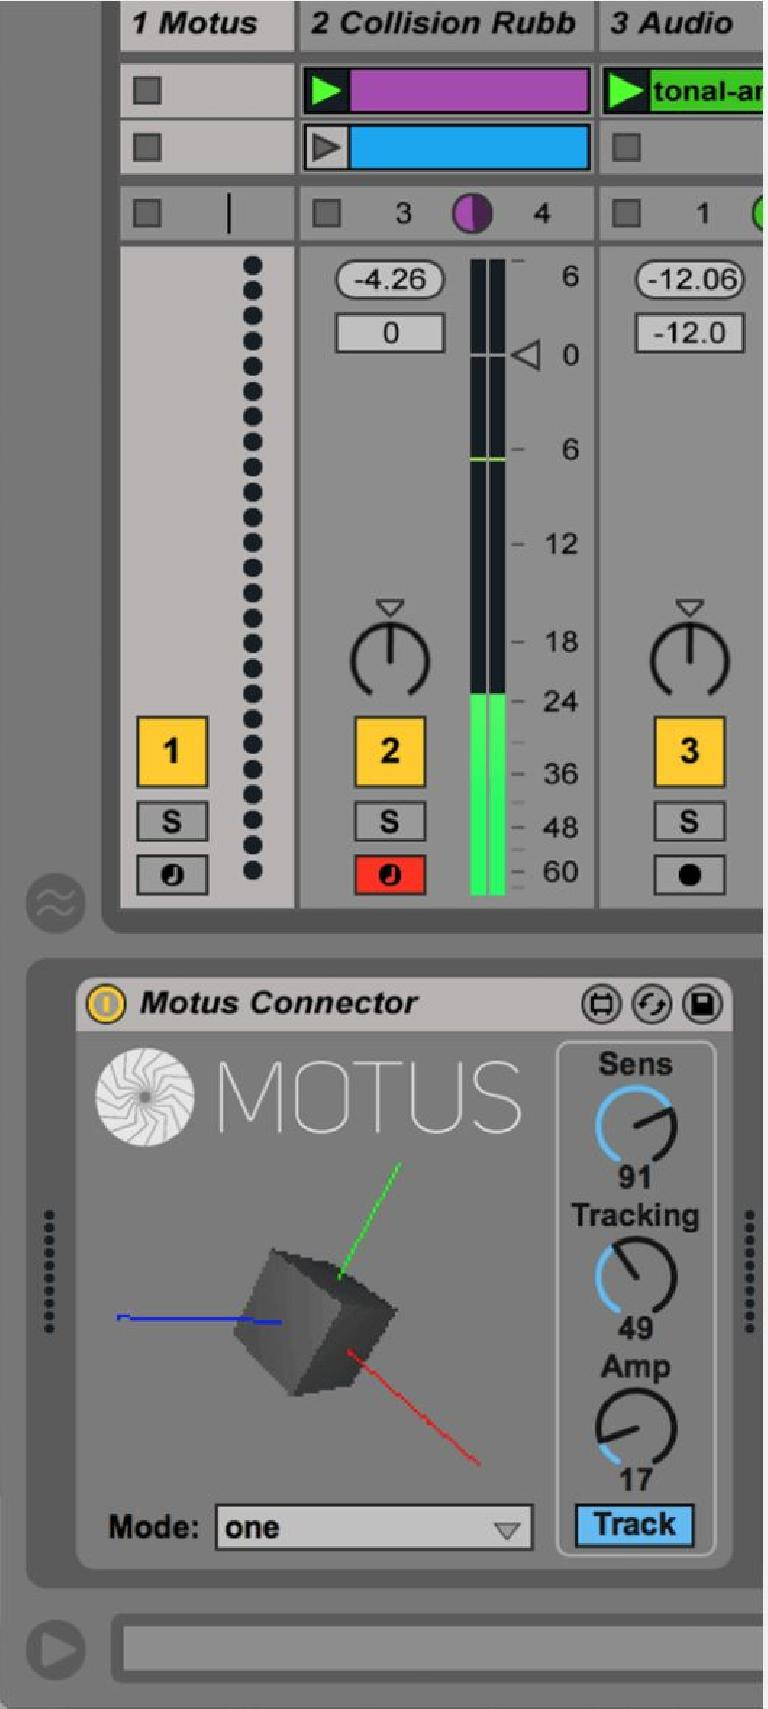 Motus M4L device in Live 9.